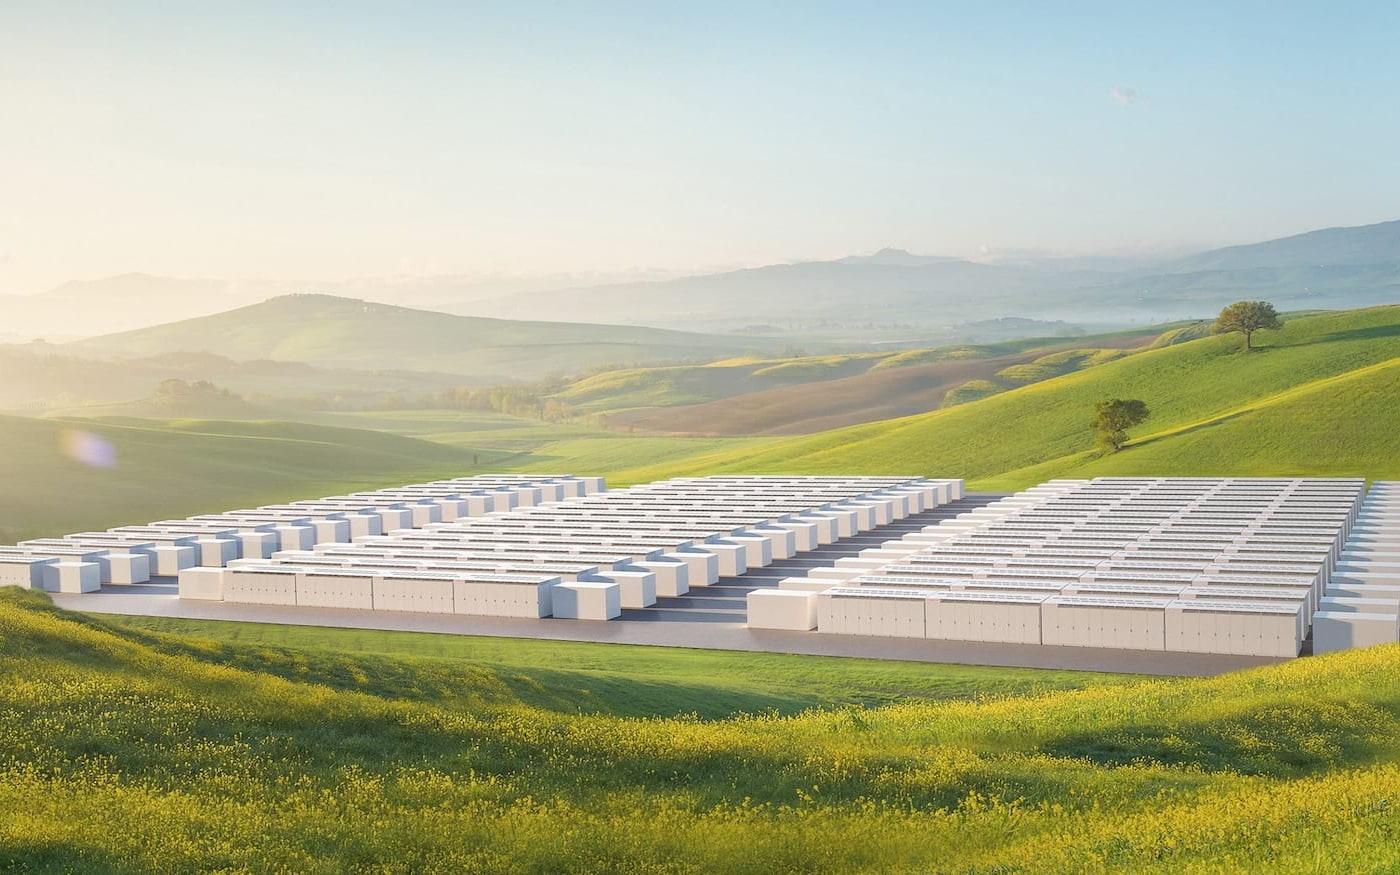 Tesla anuncia Megapack, capaz de produzir energia limpa em grande escala